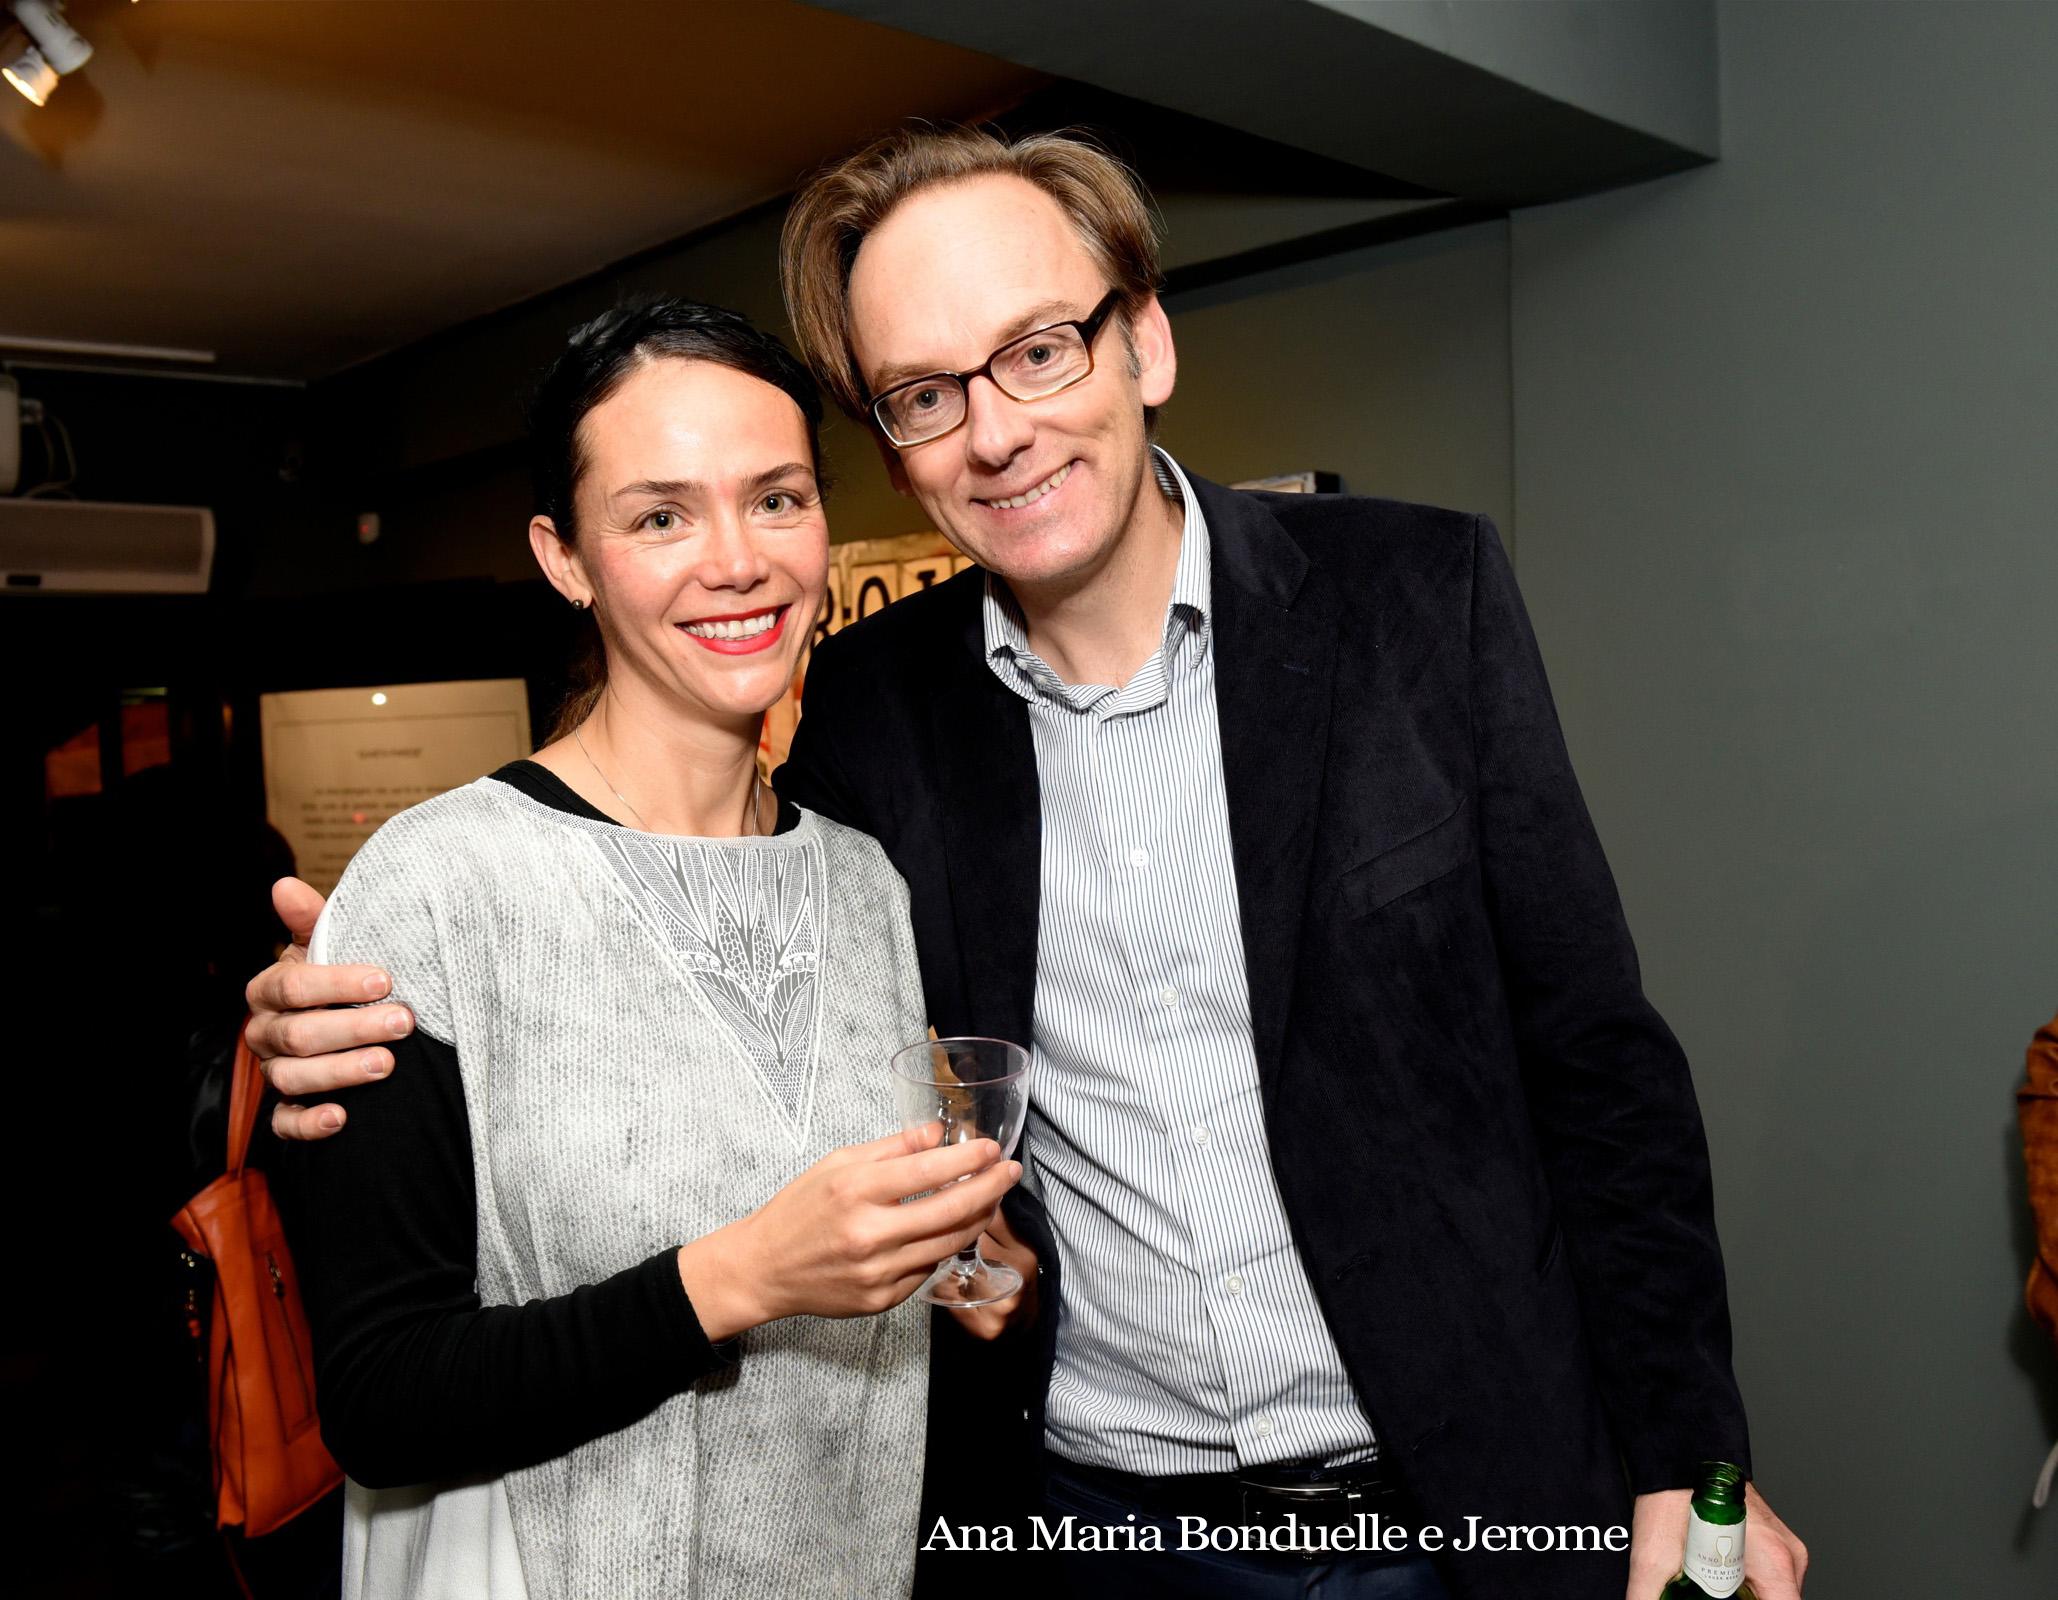 Ana Maria Bonduelle e Jerome Bonduelle